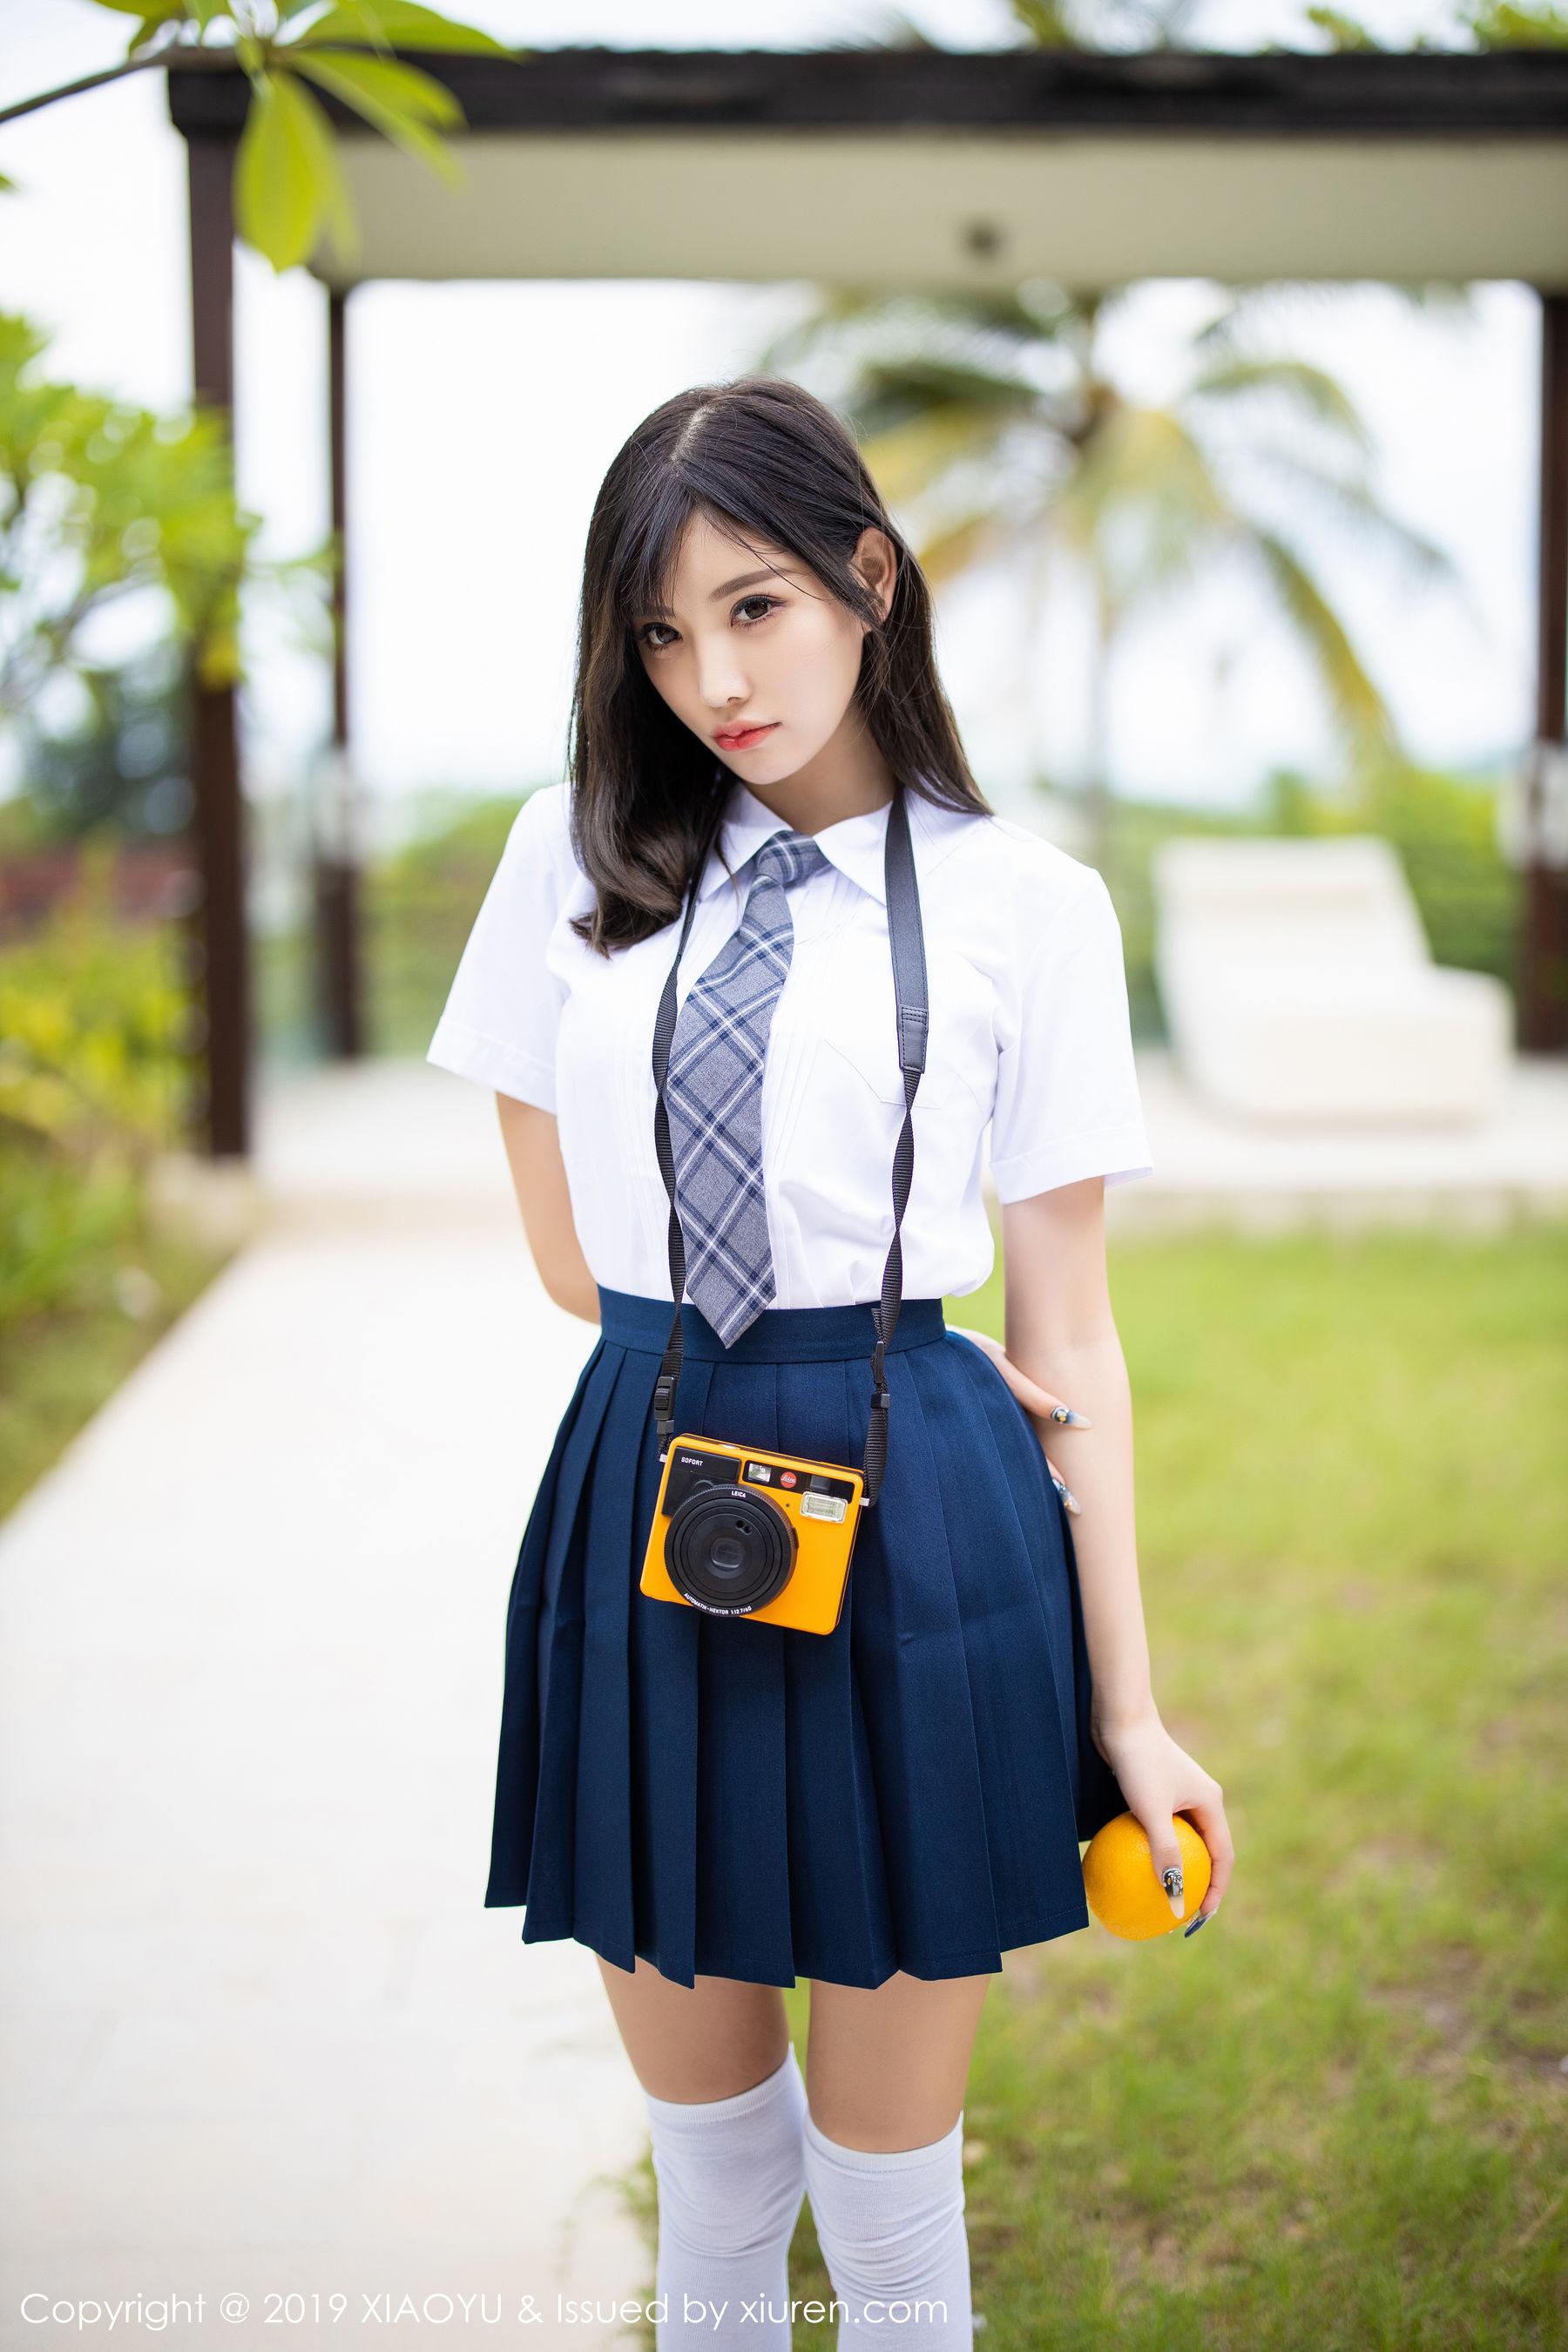 uniformc005